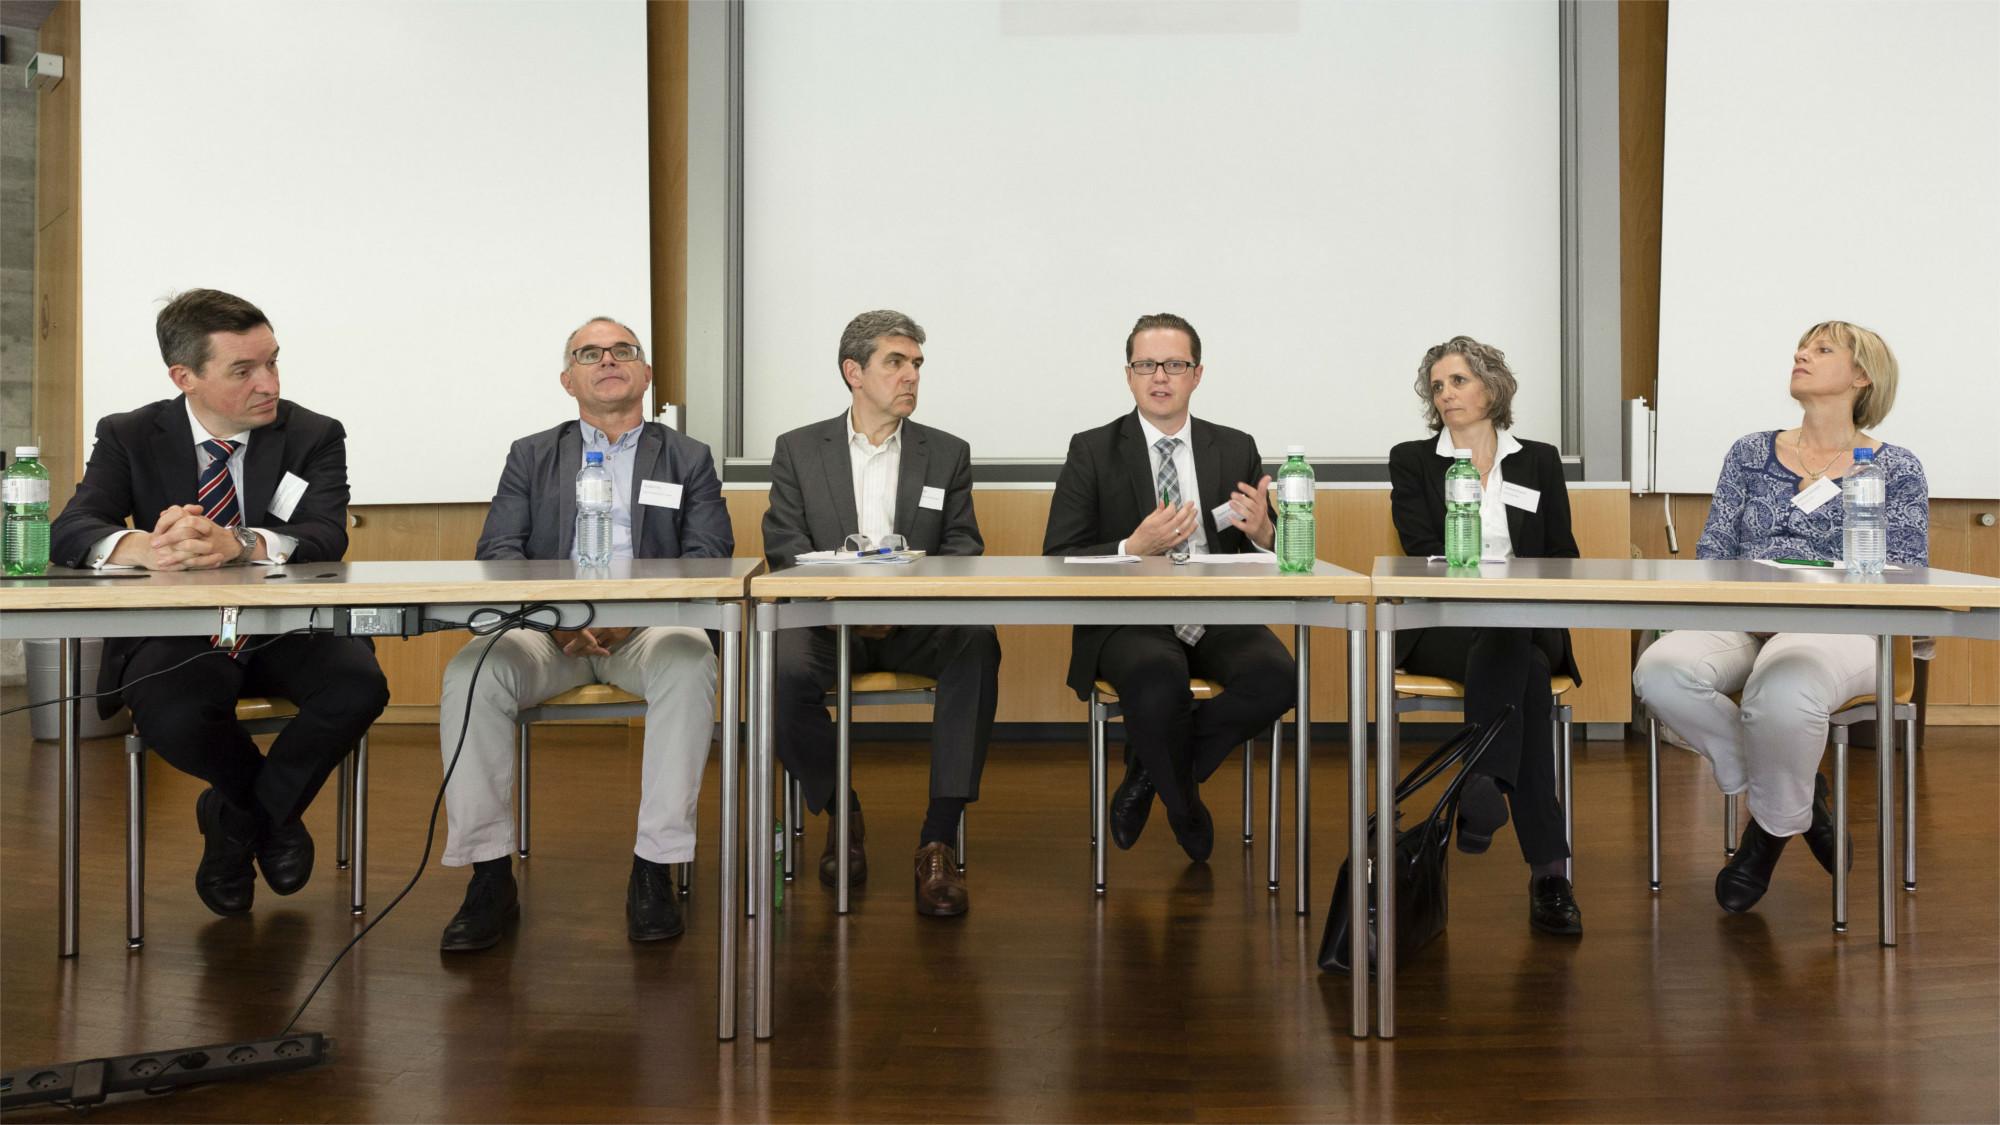 Paneldiskussion moderiert durch Prof. Dr. Stephan Böhm